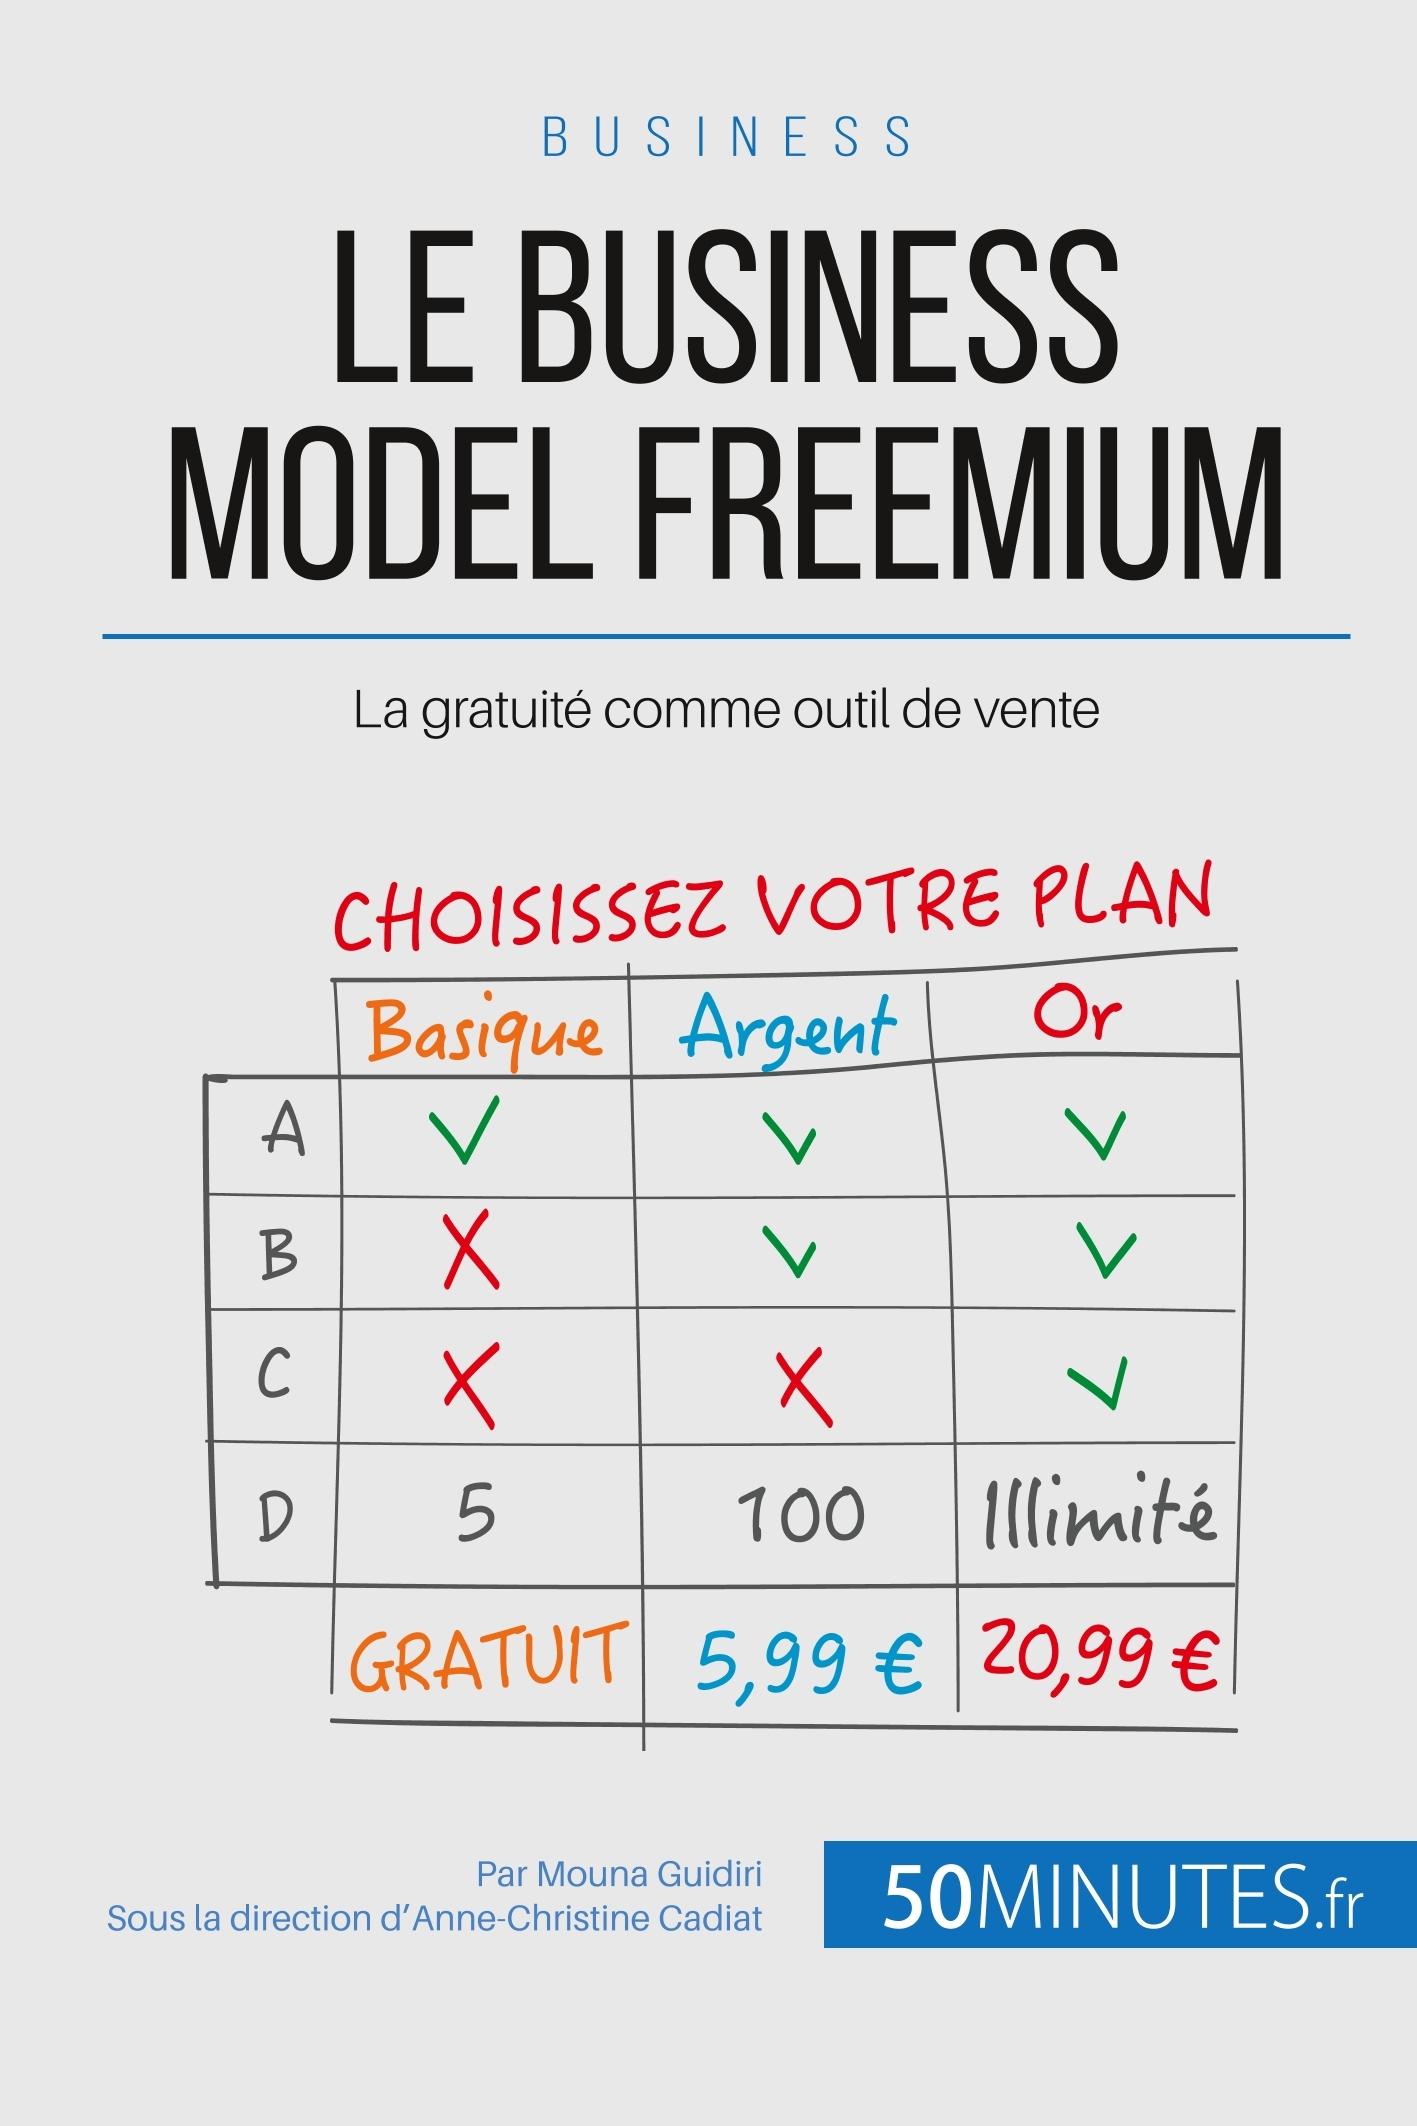 LE FREEMIUM BUSINESS MODEL DU WEB